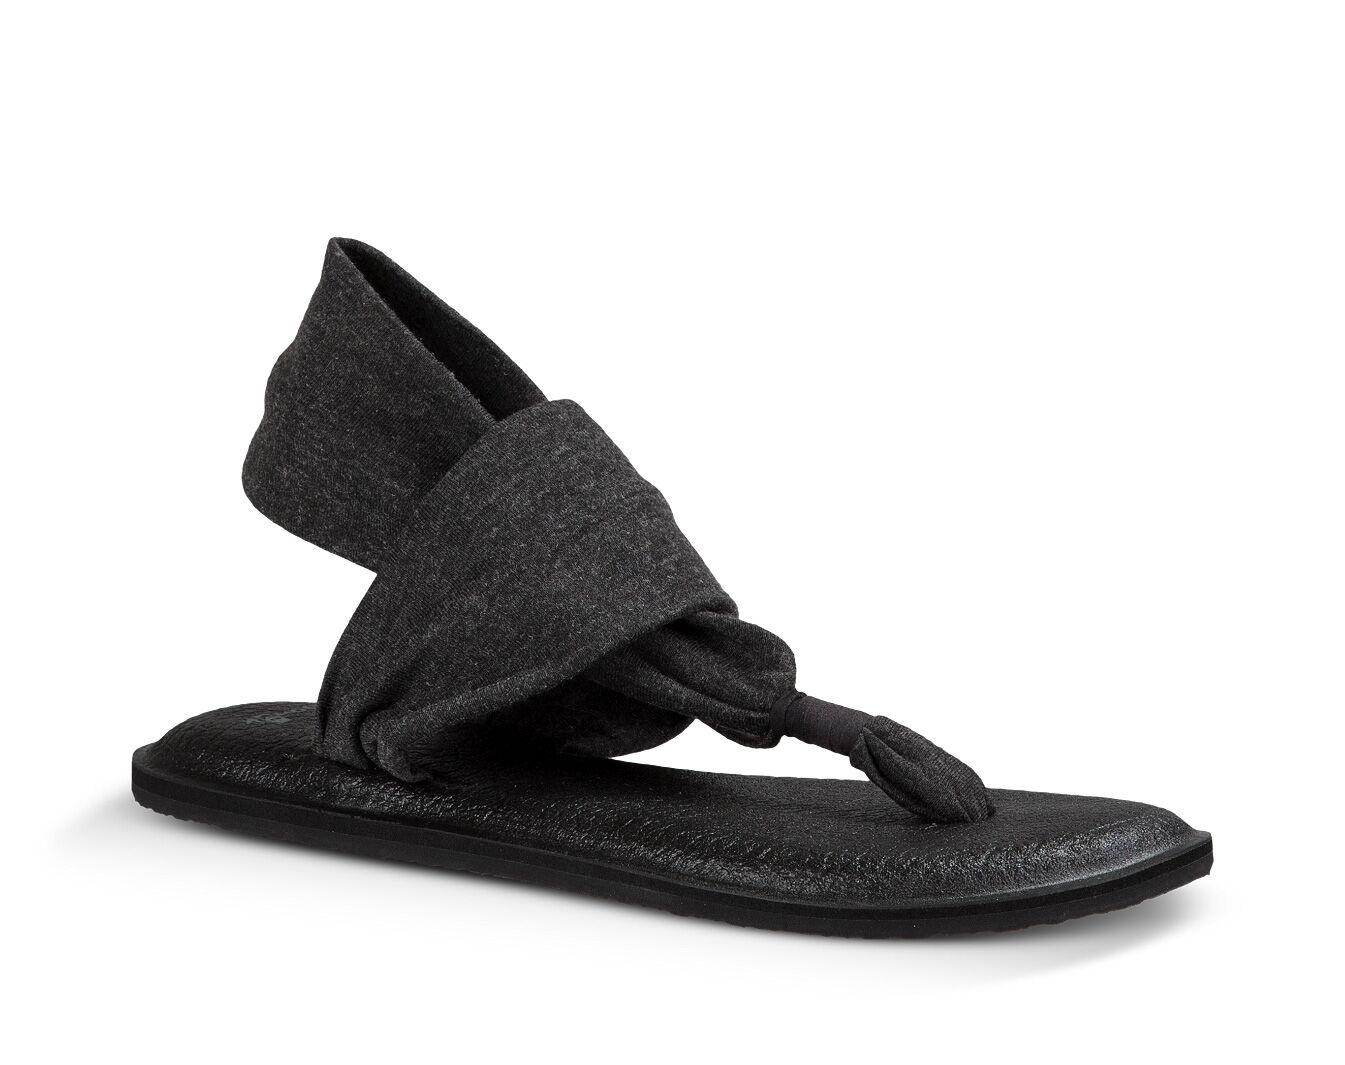 Sanuk Yoga Bliss Shoes Women Ivory Größe 36 2016 Sandalen ht4lvpOWCB